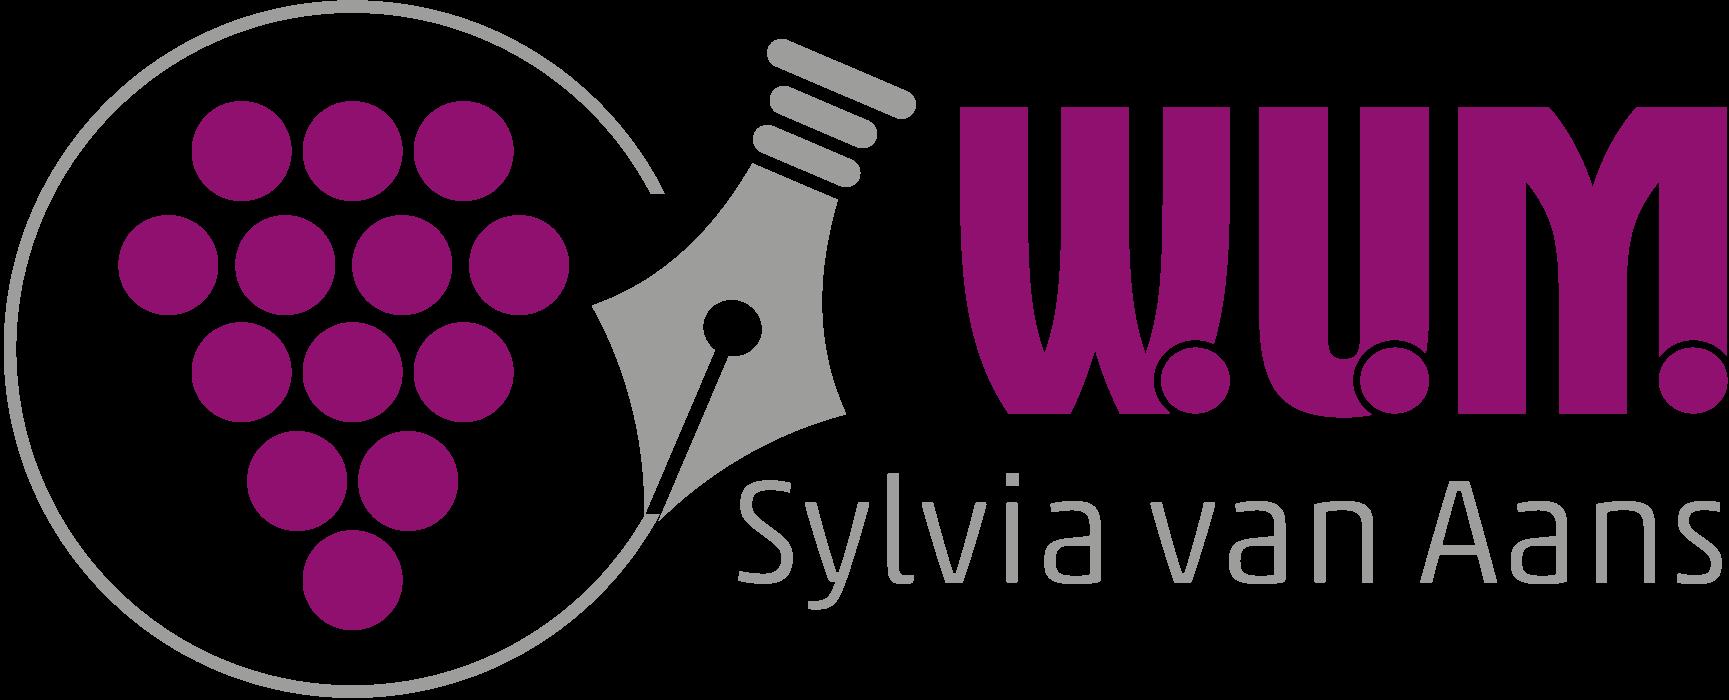 WEINKONZEPTE und mehr – Sylvia van Aans